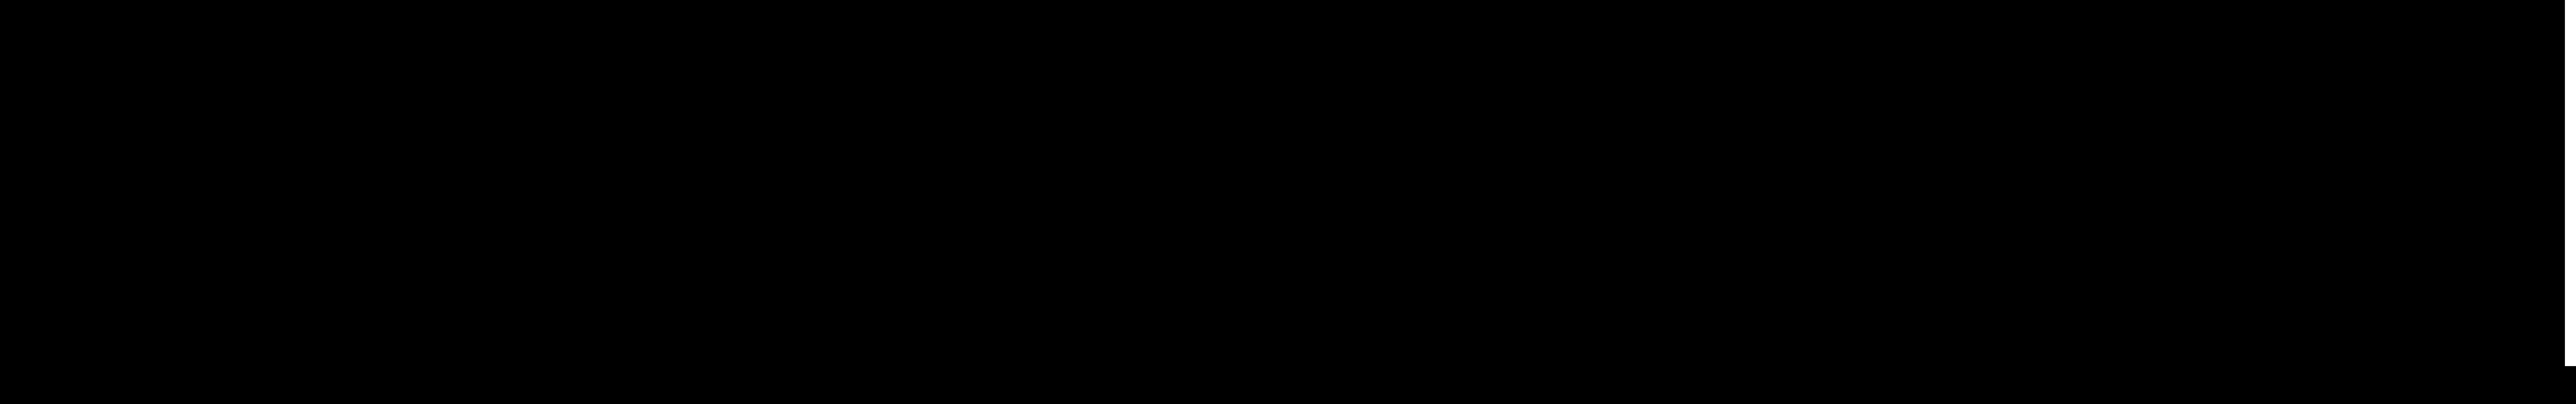 ISSUES 2014 Logo by NordlingArt on DeviantArt.